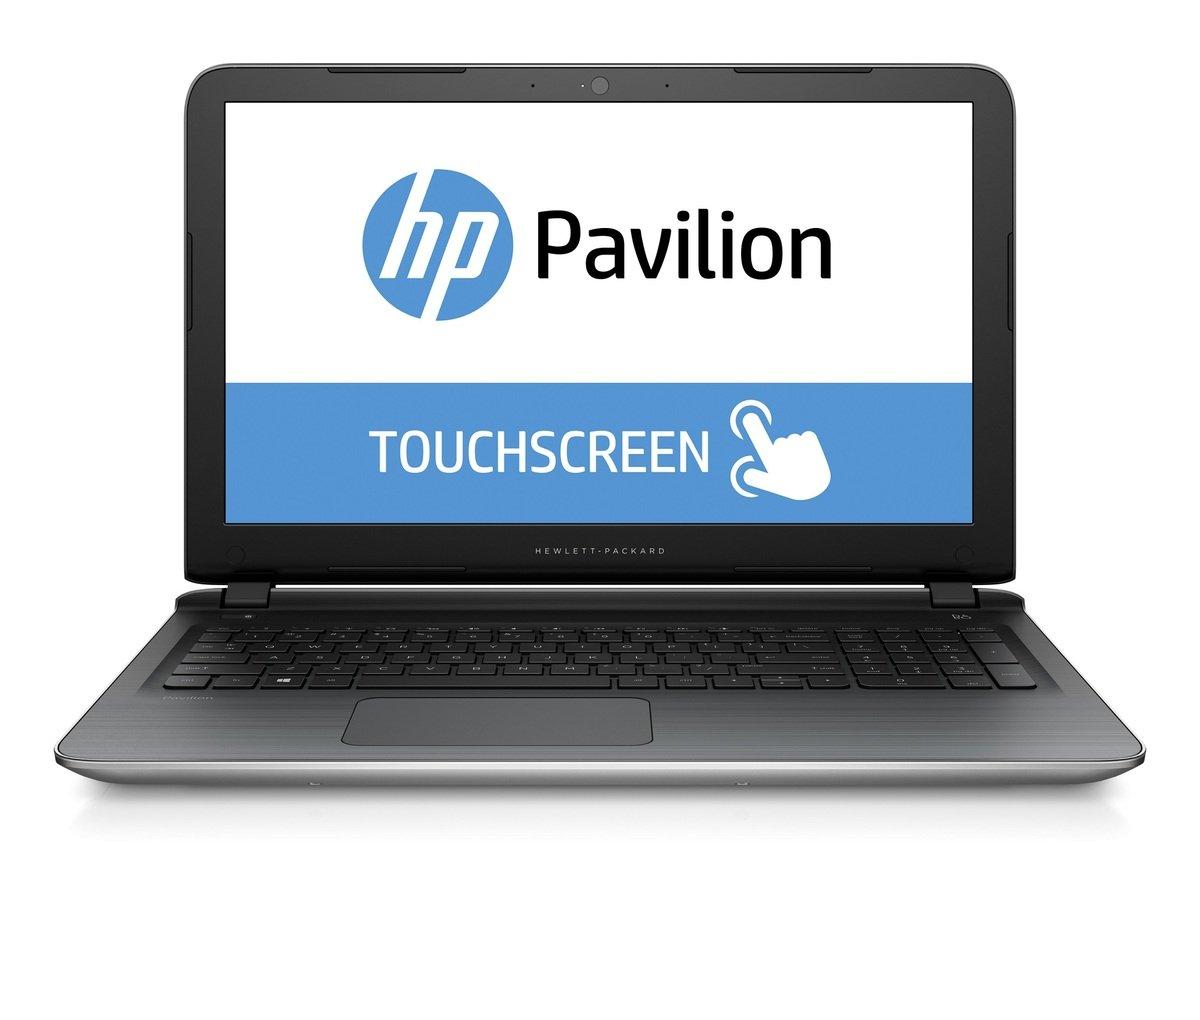 Pavilion 15-ab234TX 筆記簿型電腦